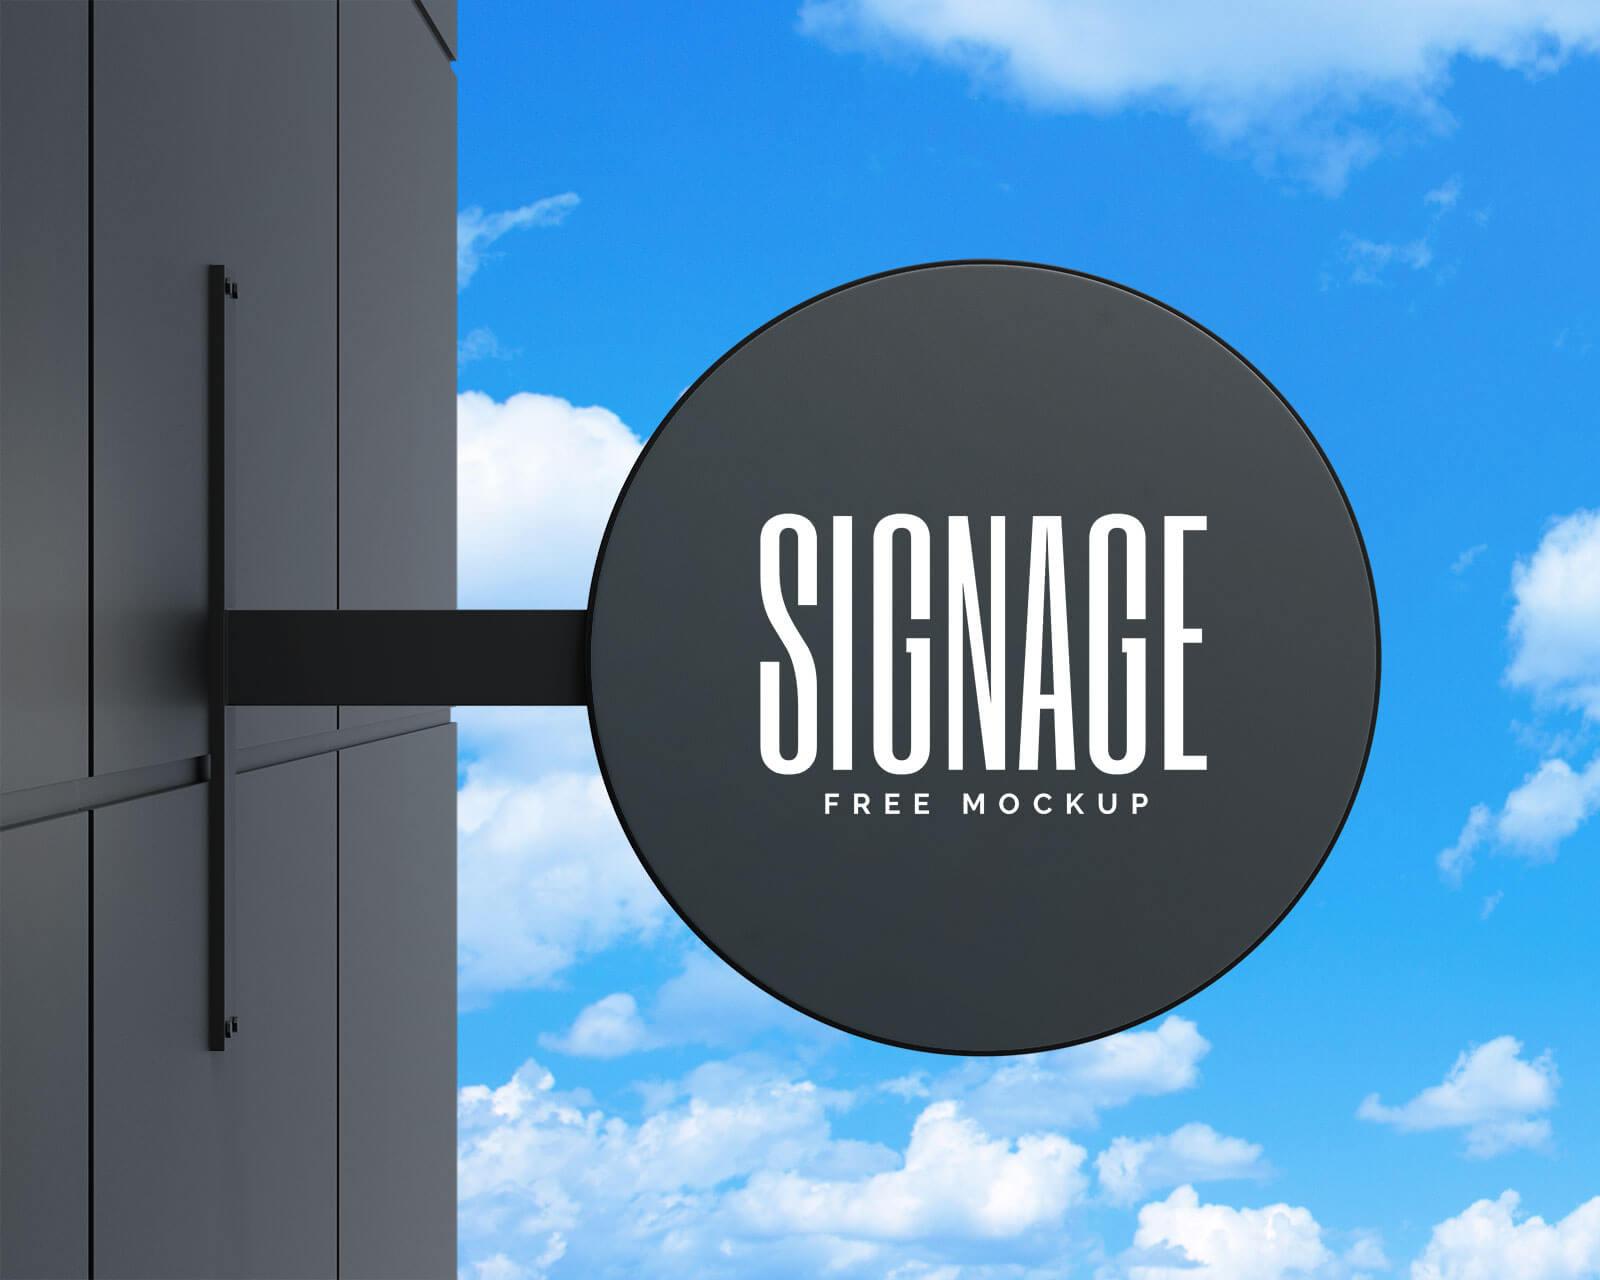 Free Round Wall Mounted Signage Mockup PSD Set